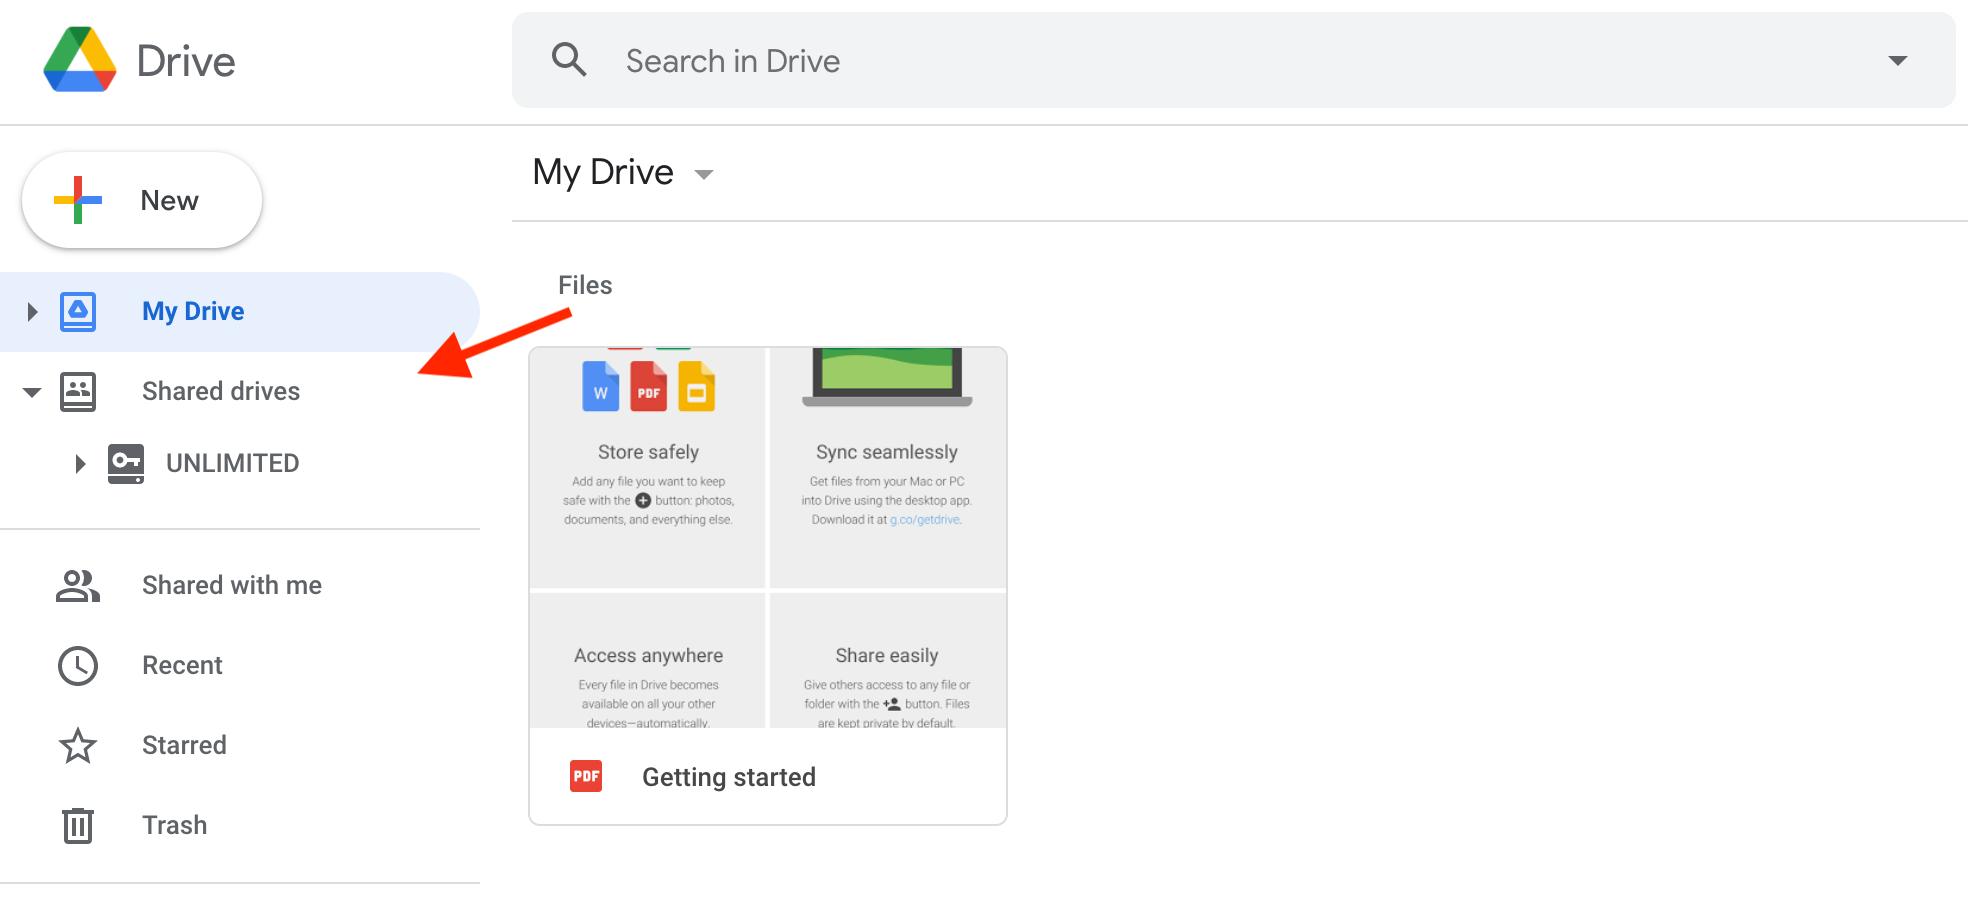 Shared drives